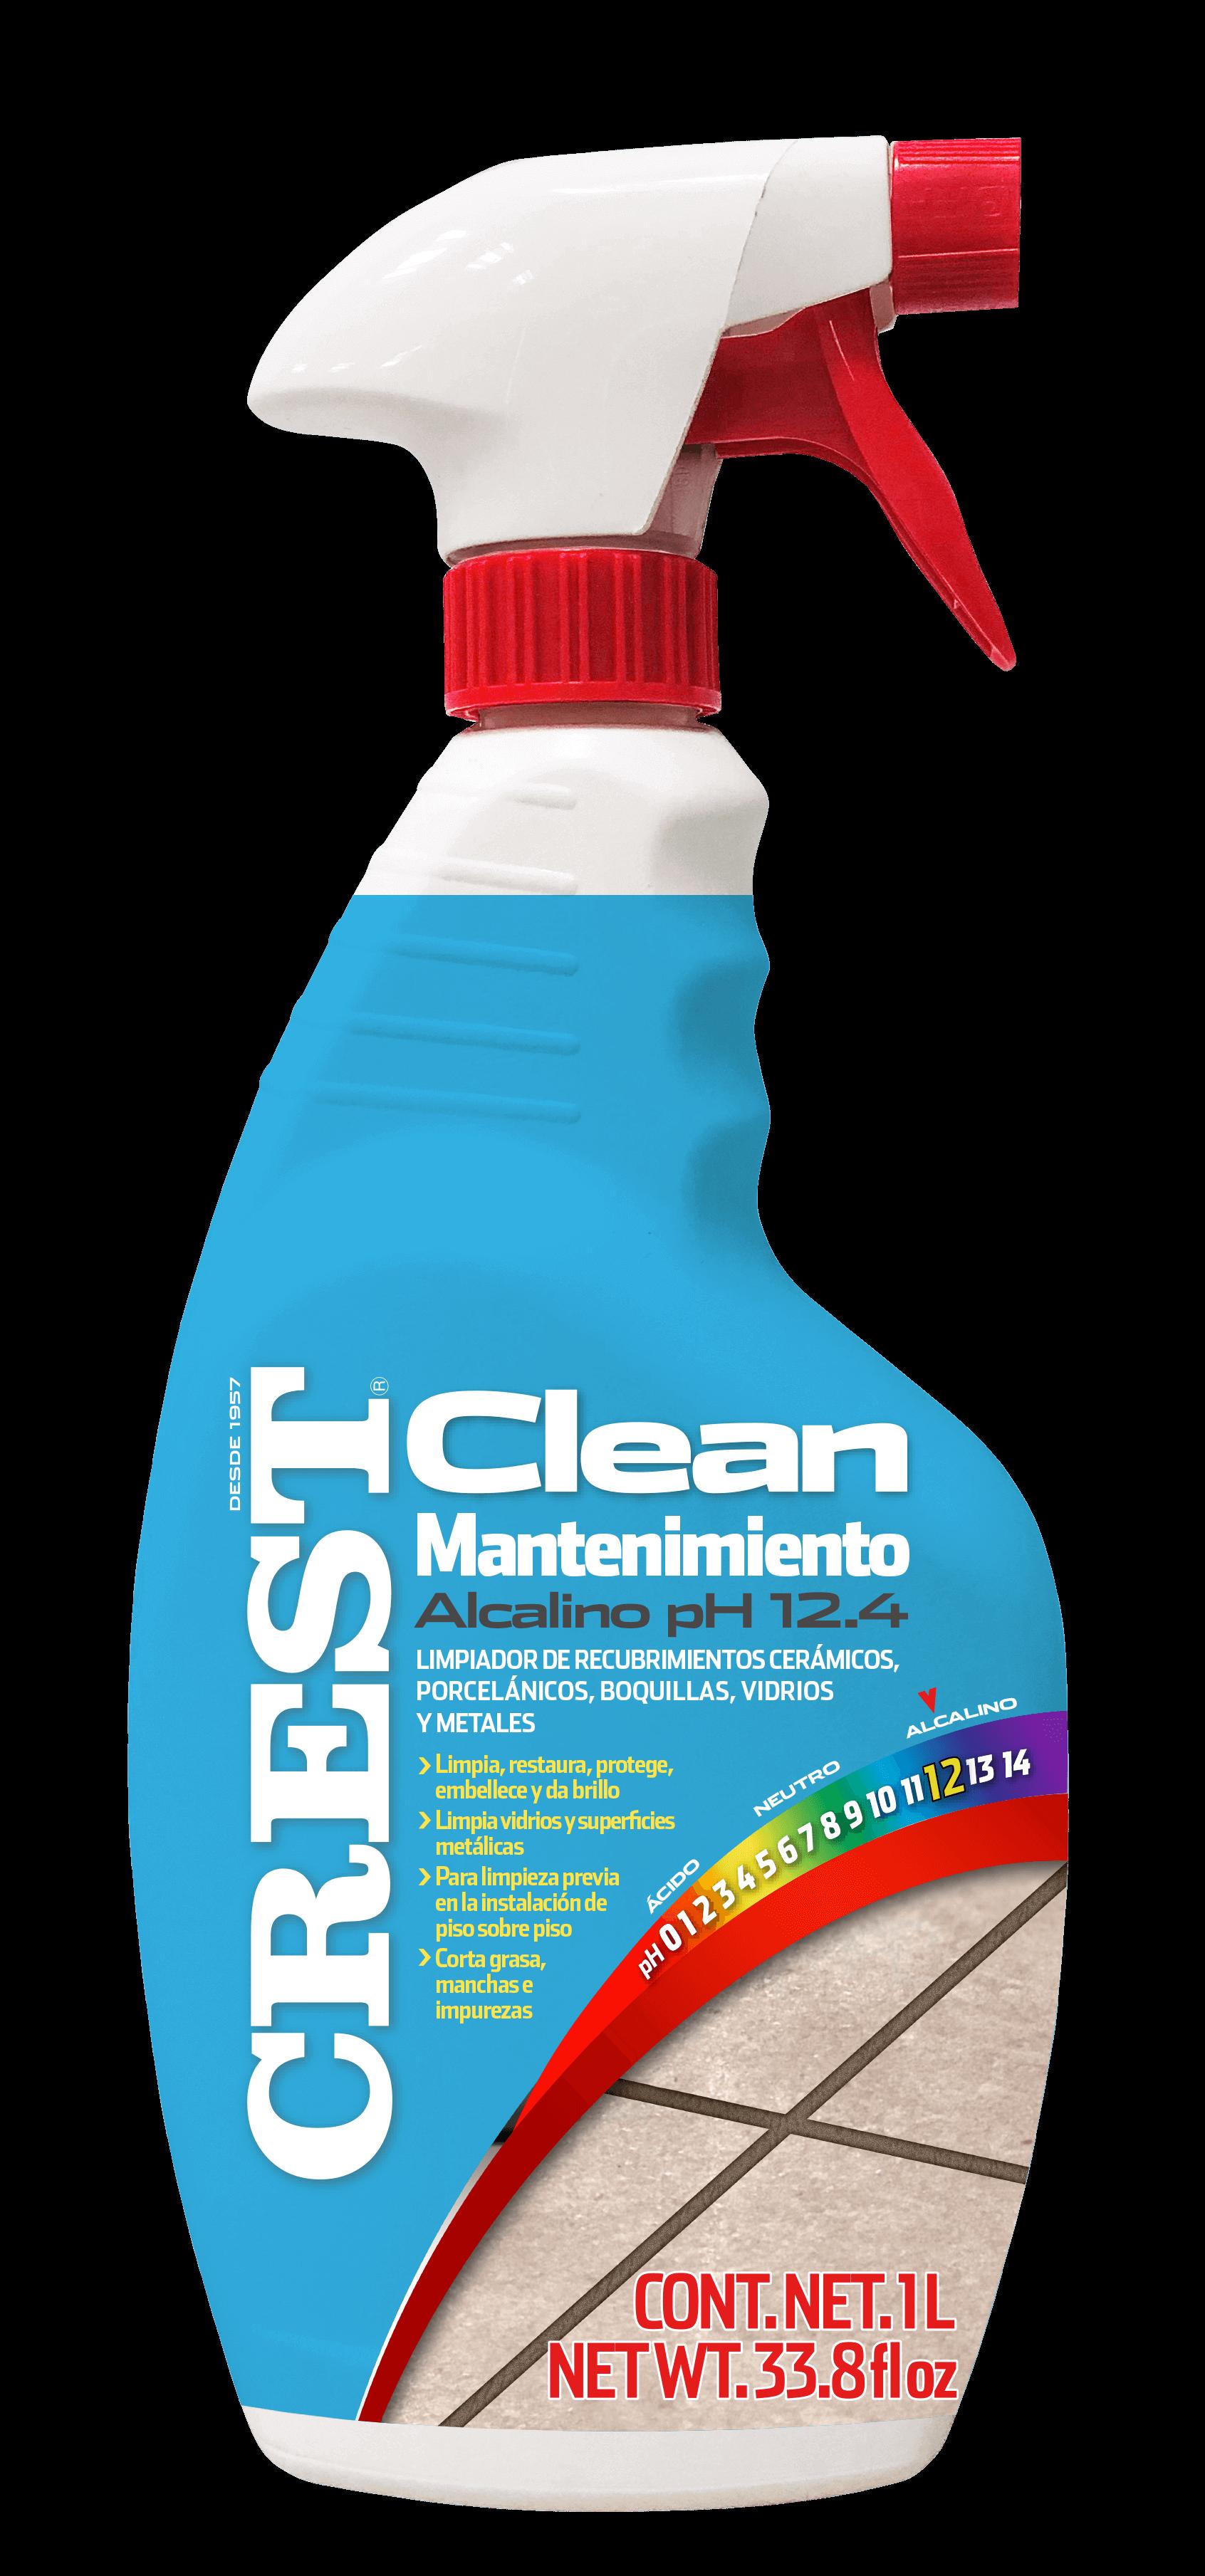 Adhesivo clean mantenimiento